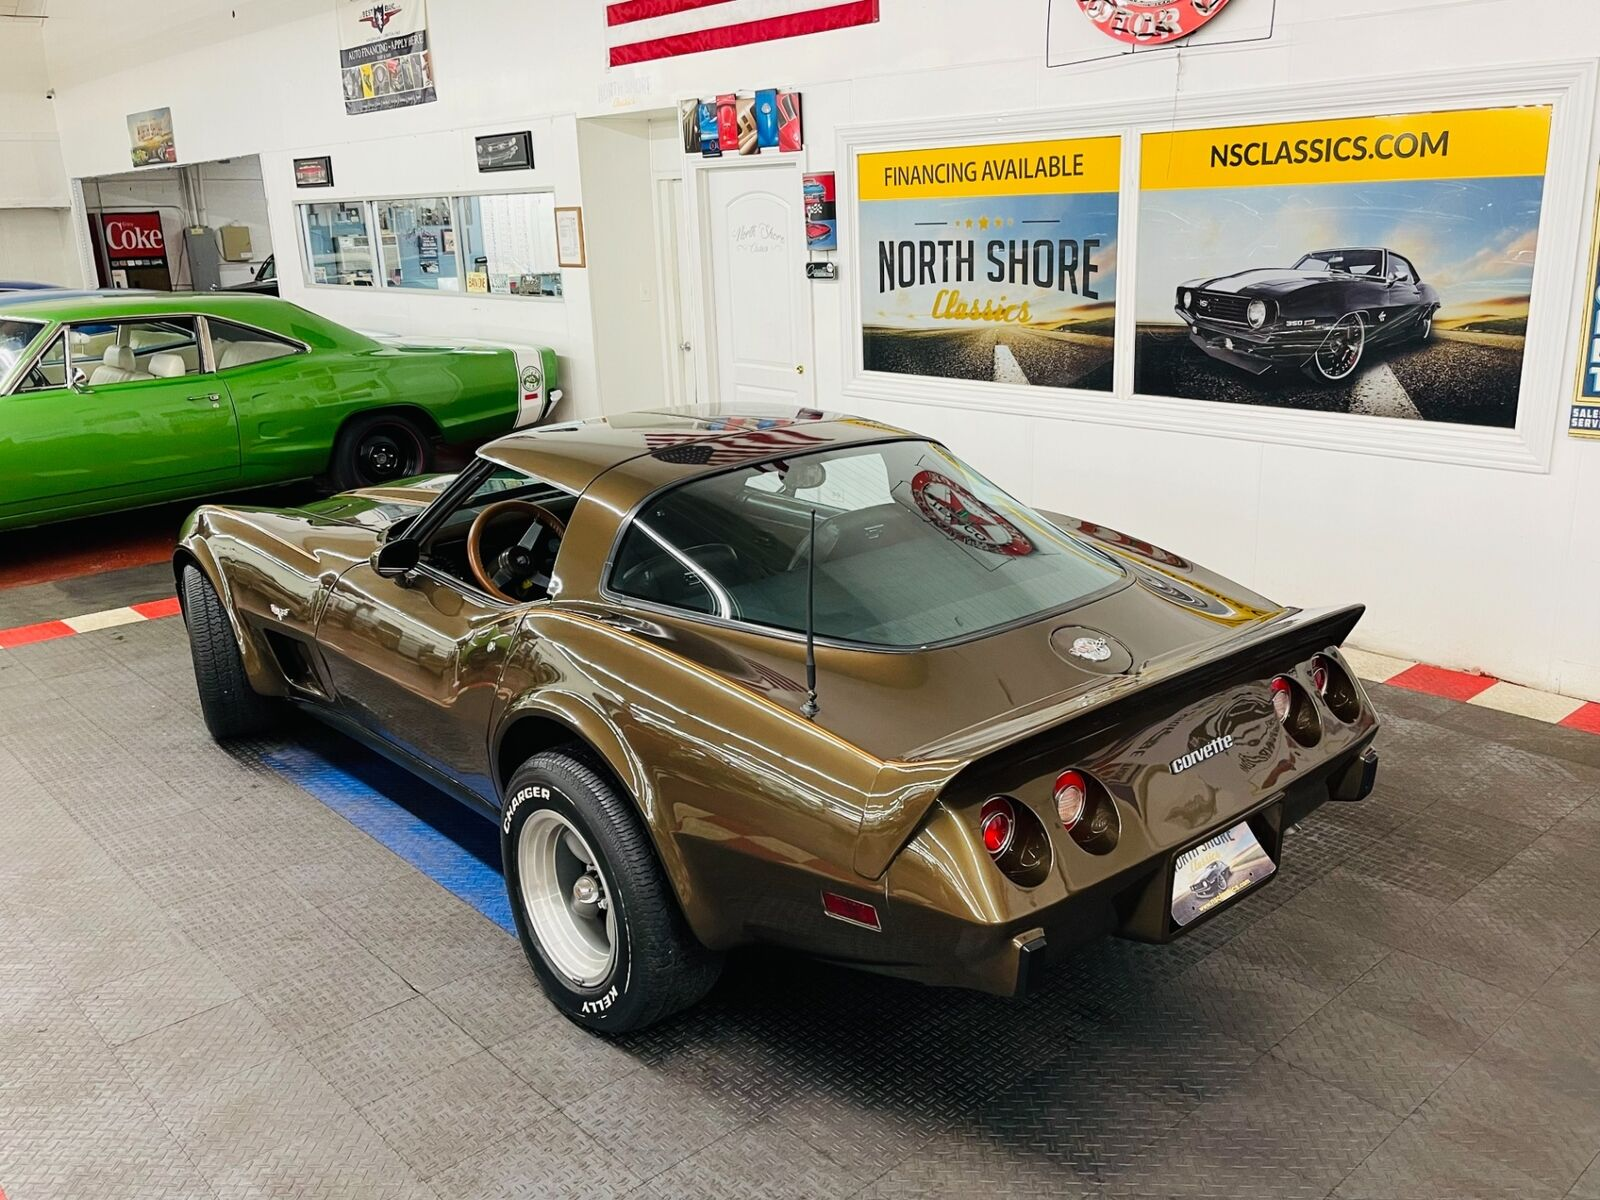 1978 Brown Chevrolet Corvette   | C3 Corvette Photo 3